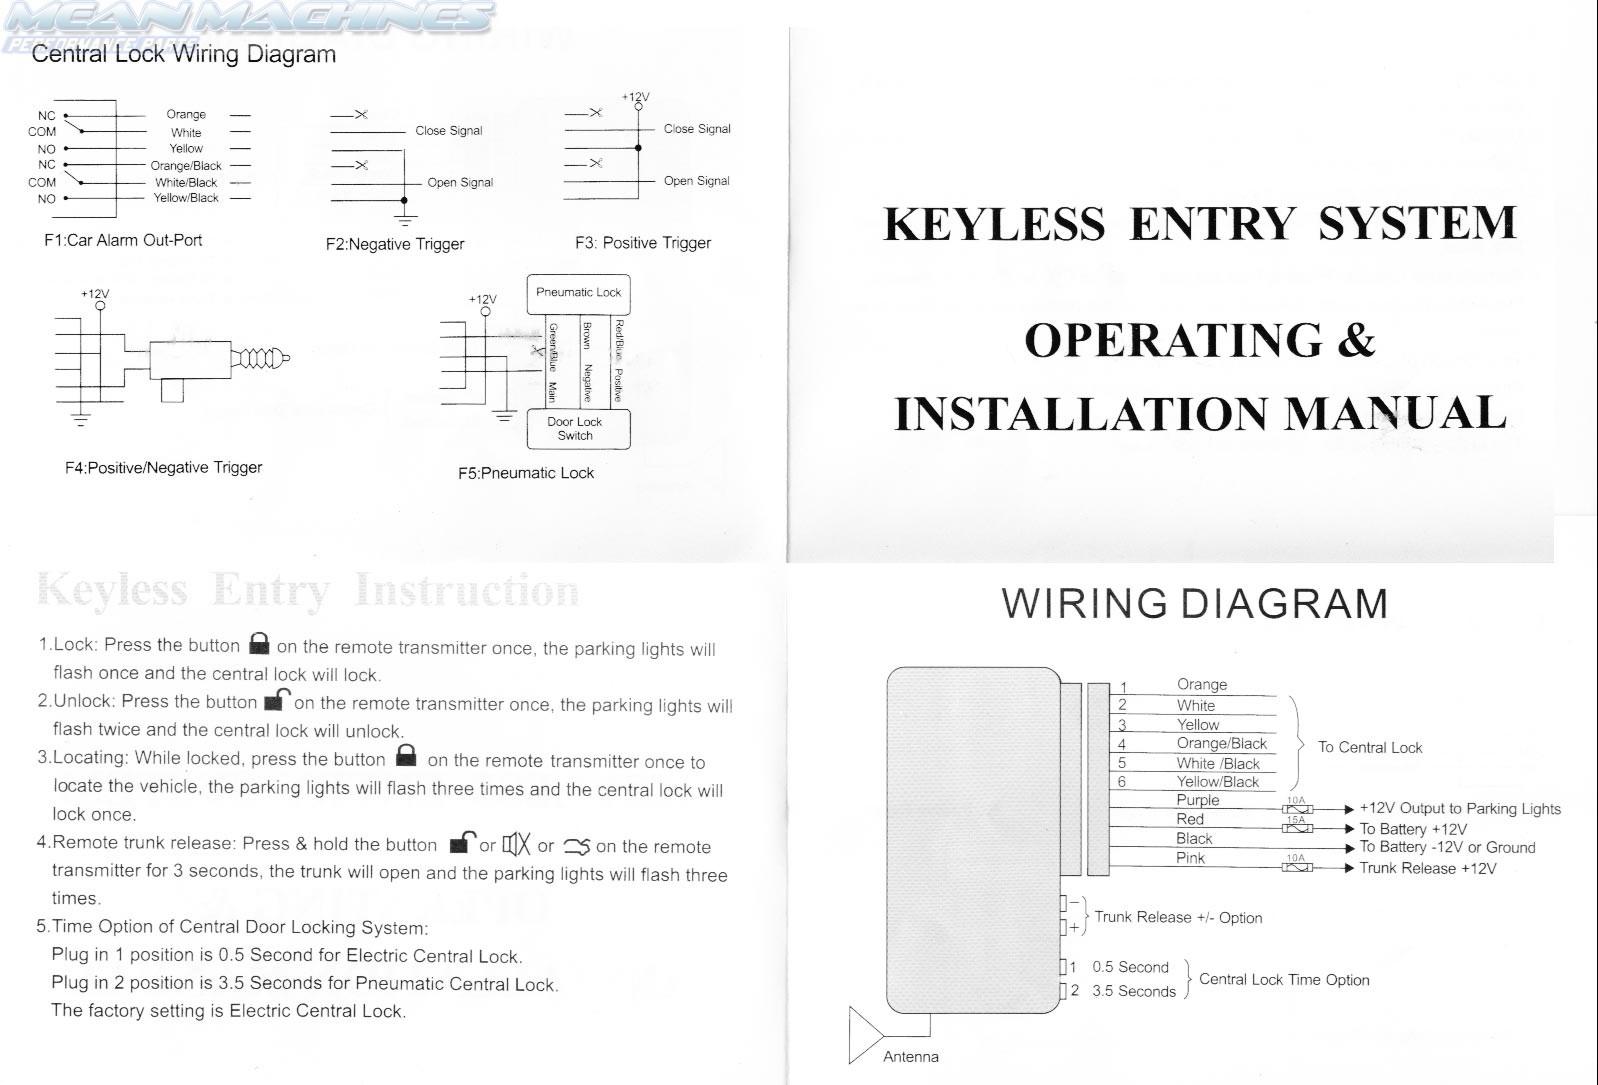 Viper 5901 wiring diagram dolgular unusual 7145 viper alarm wire diagram pictures inspiration cheapraybanclubmaster Gallery